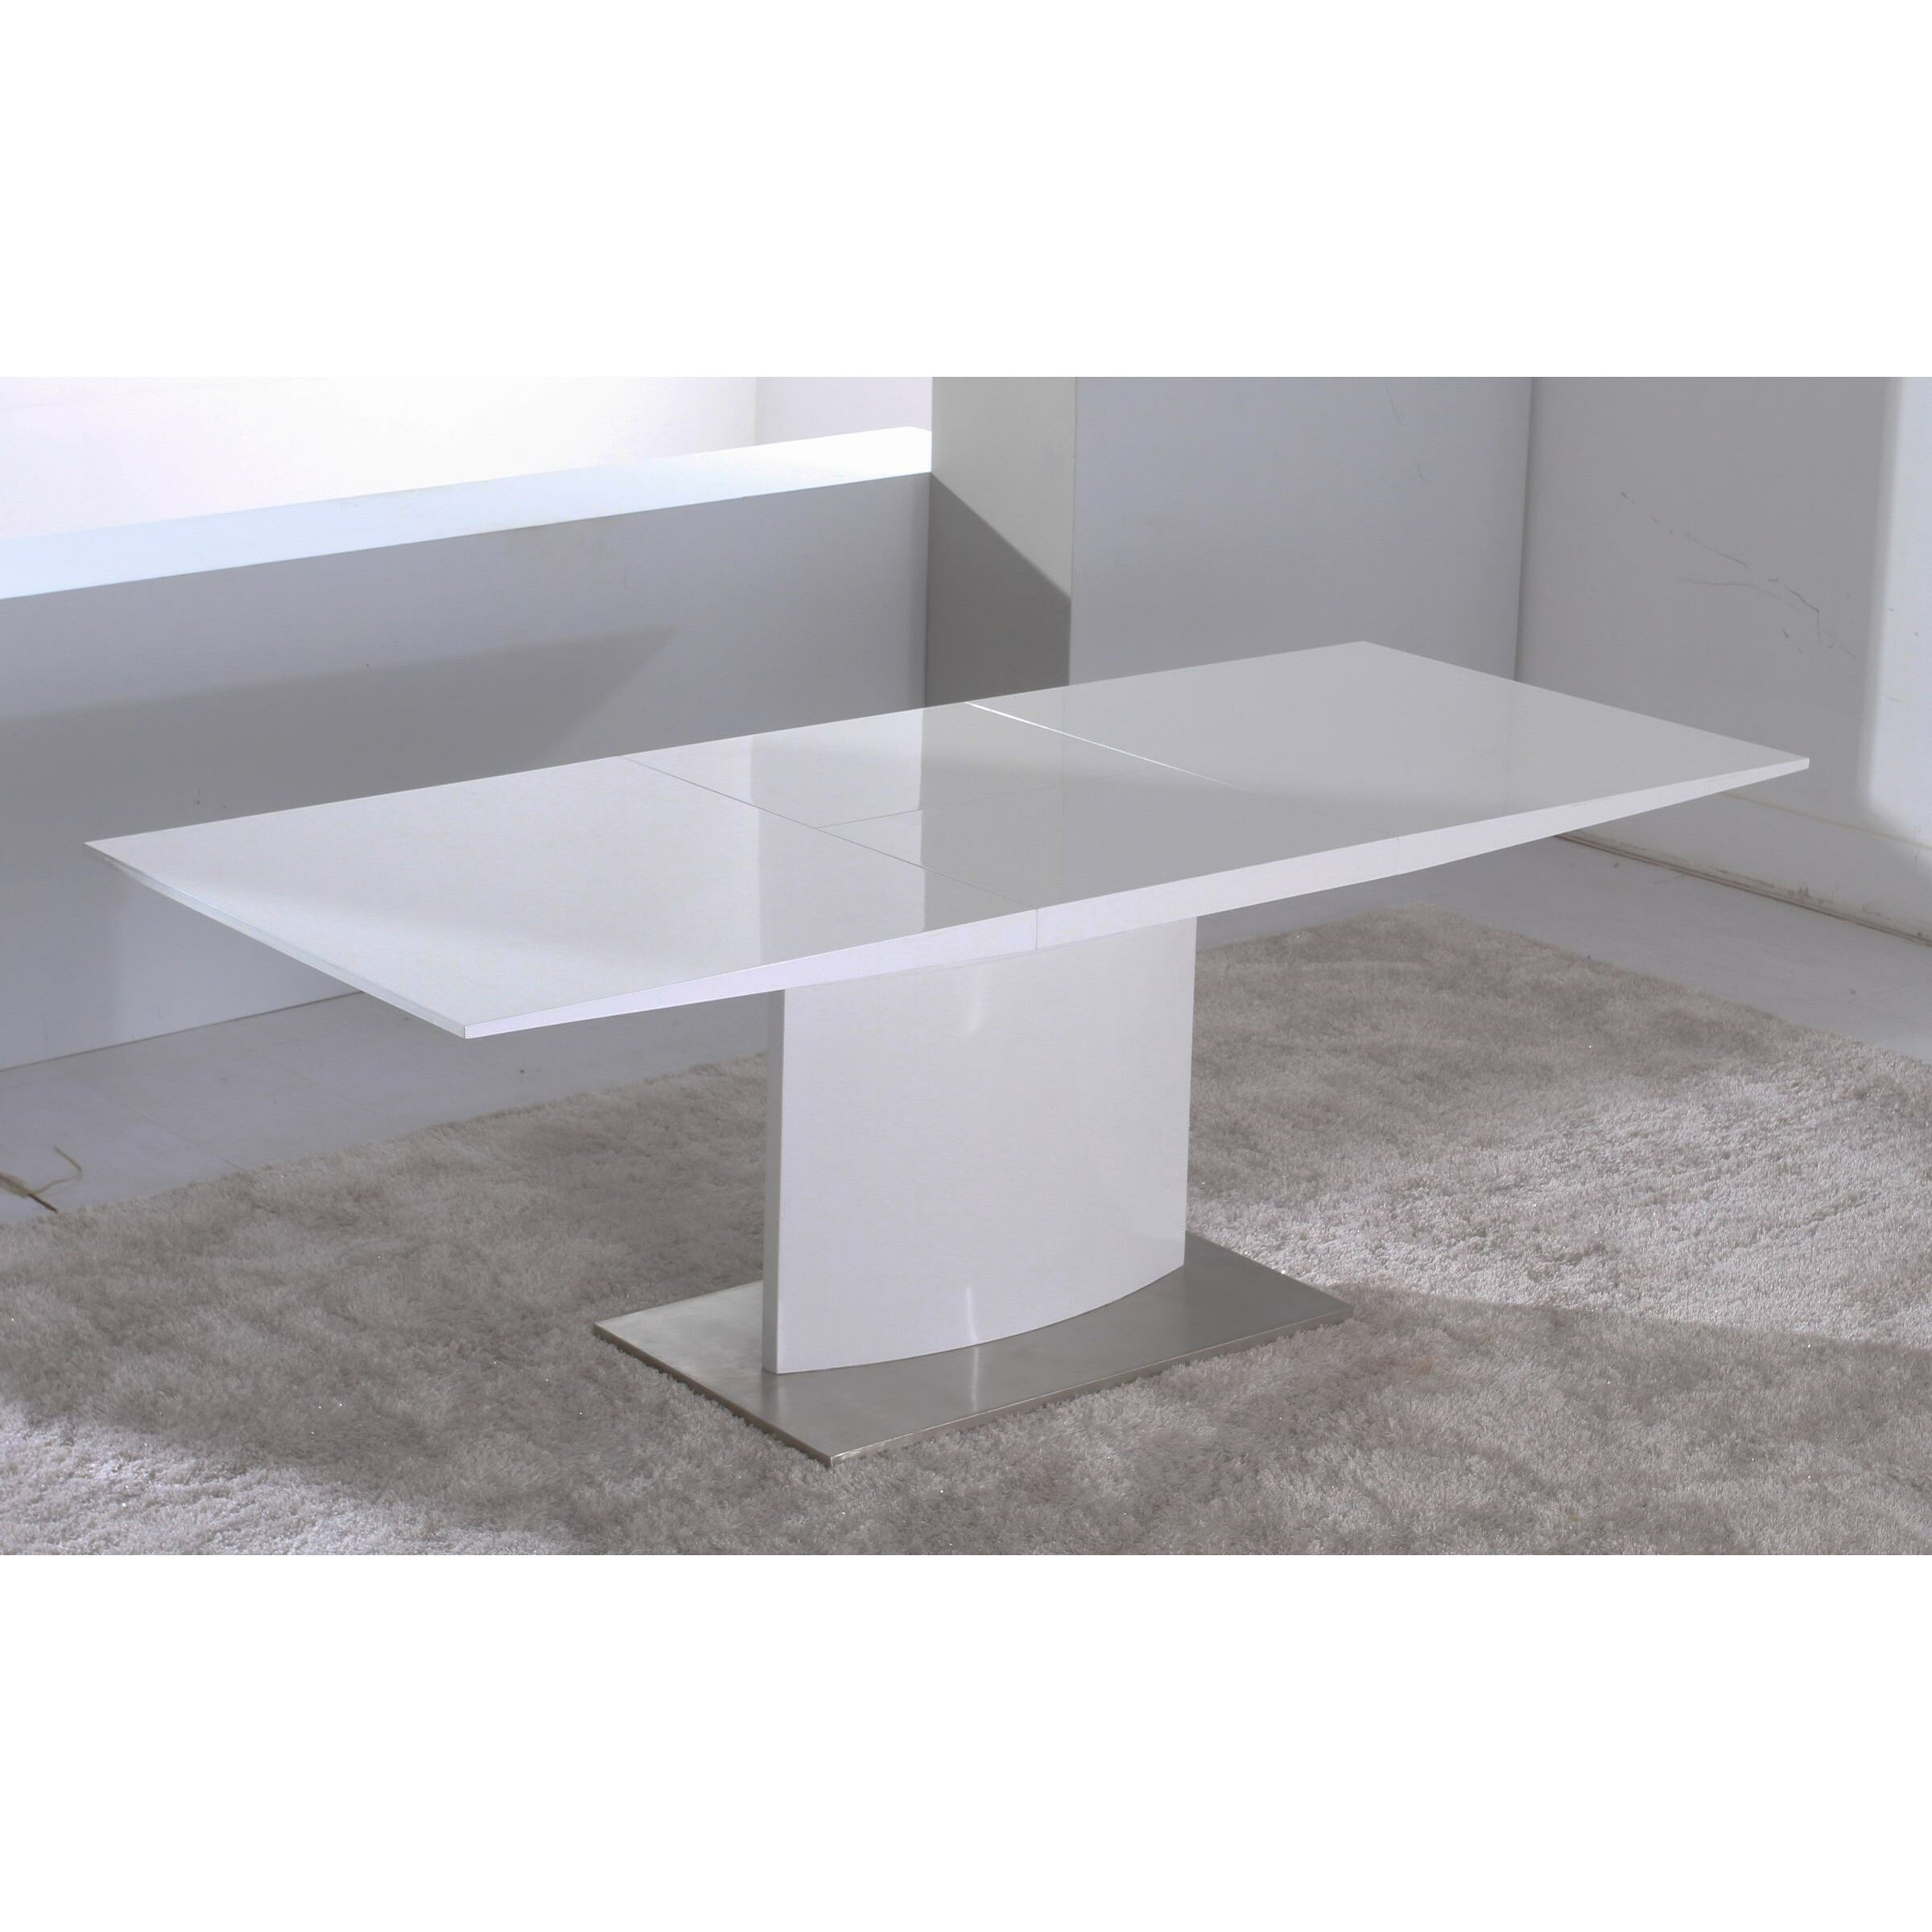 Creative images international extendable dining table for Creative dining tables